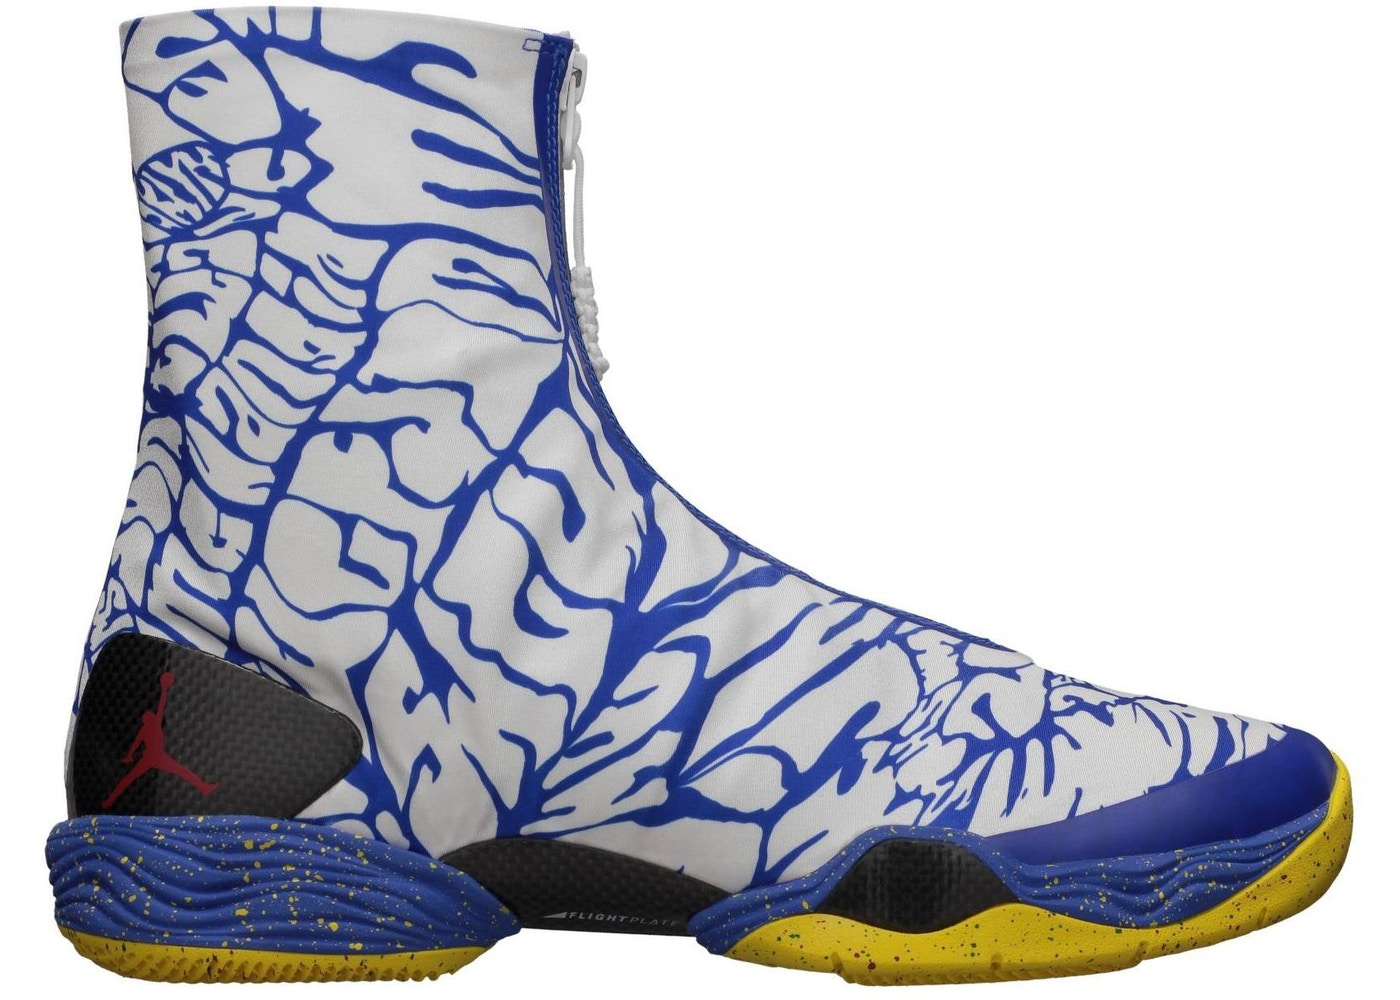 newest 92ce1 9c116 Buy Air Jordan 28 Shoes & Deadstock Sneakers